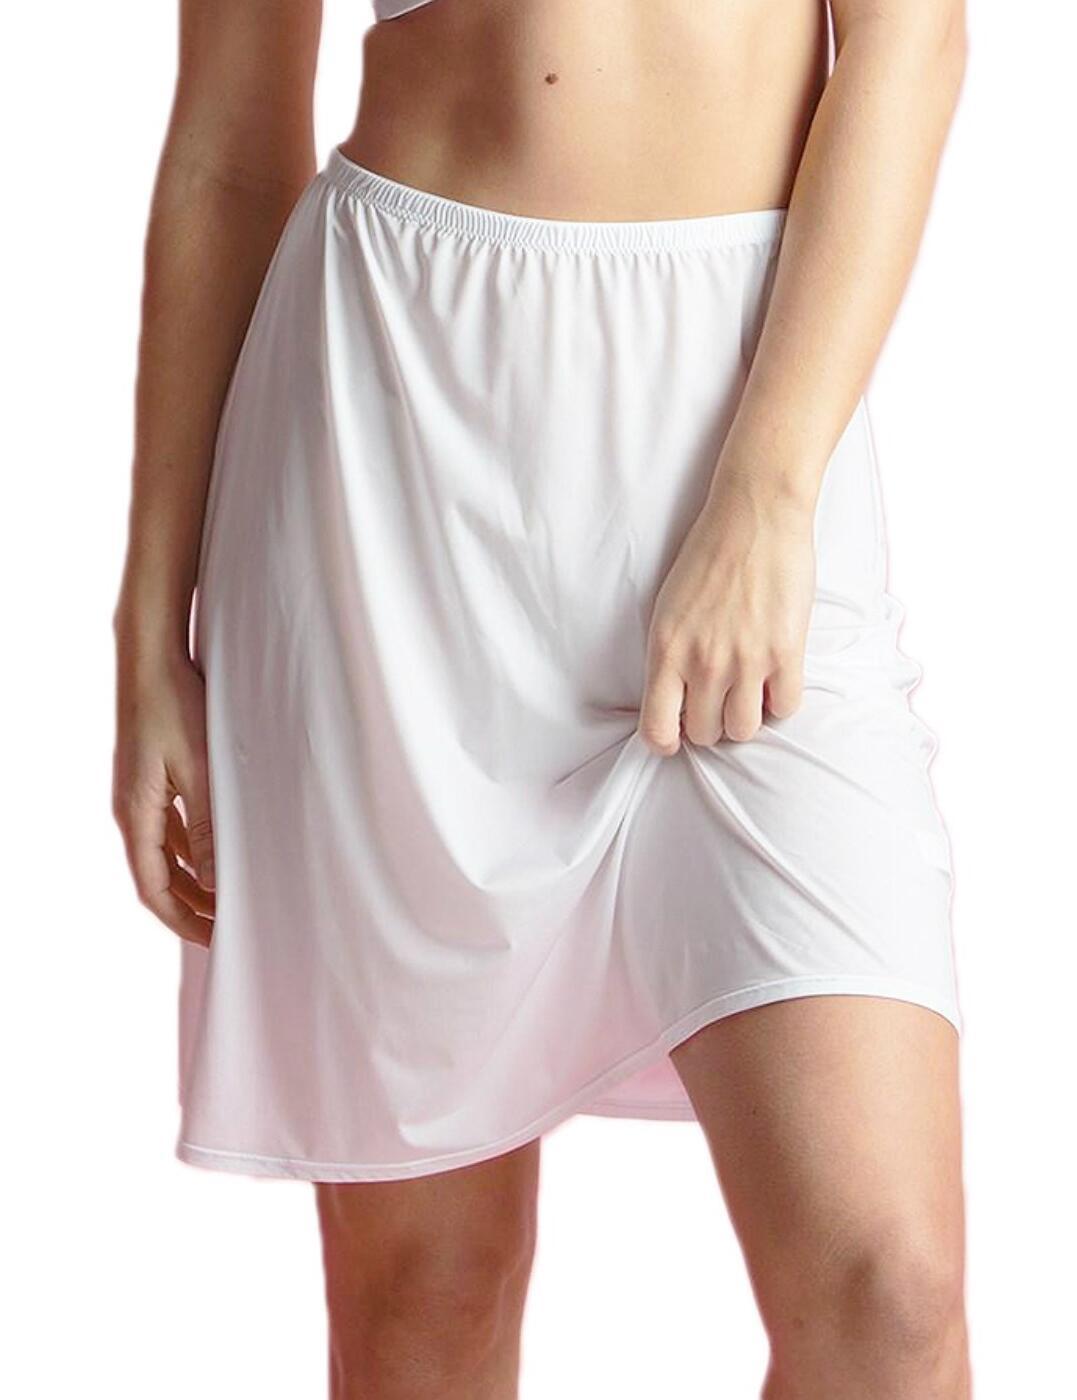 3817 Pour Moi Body Comfort Half Slip - 3817 White